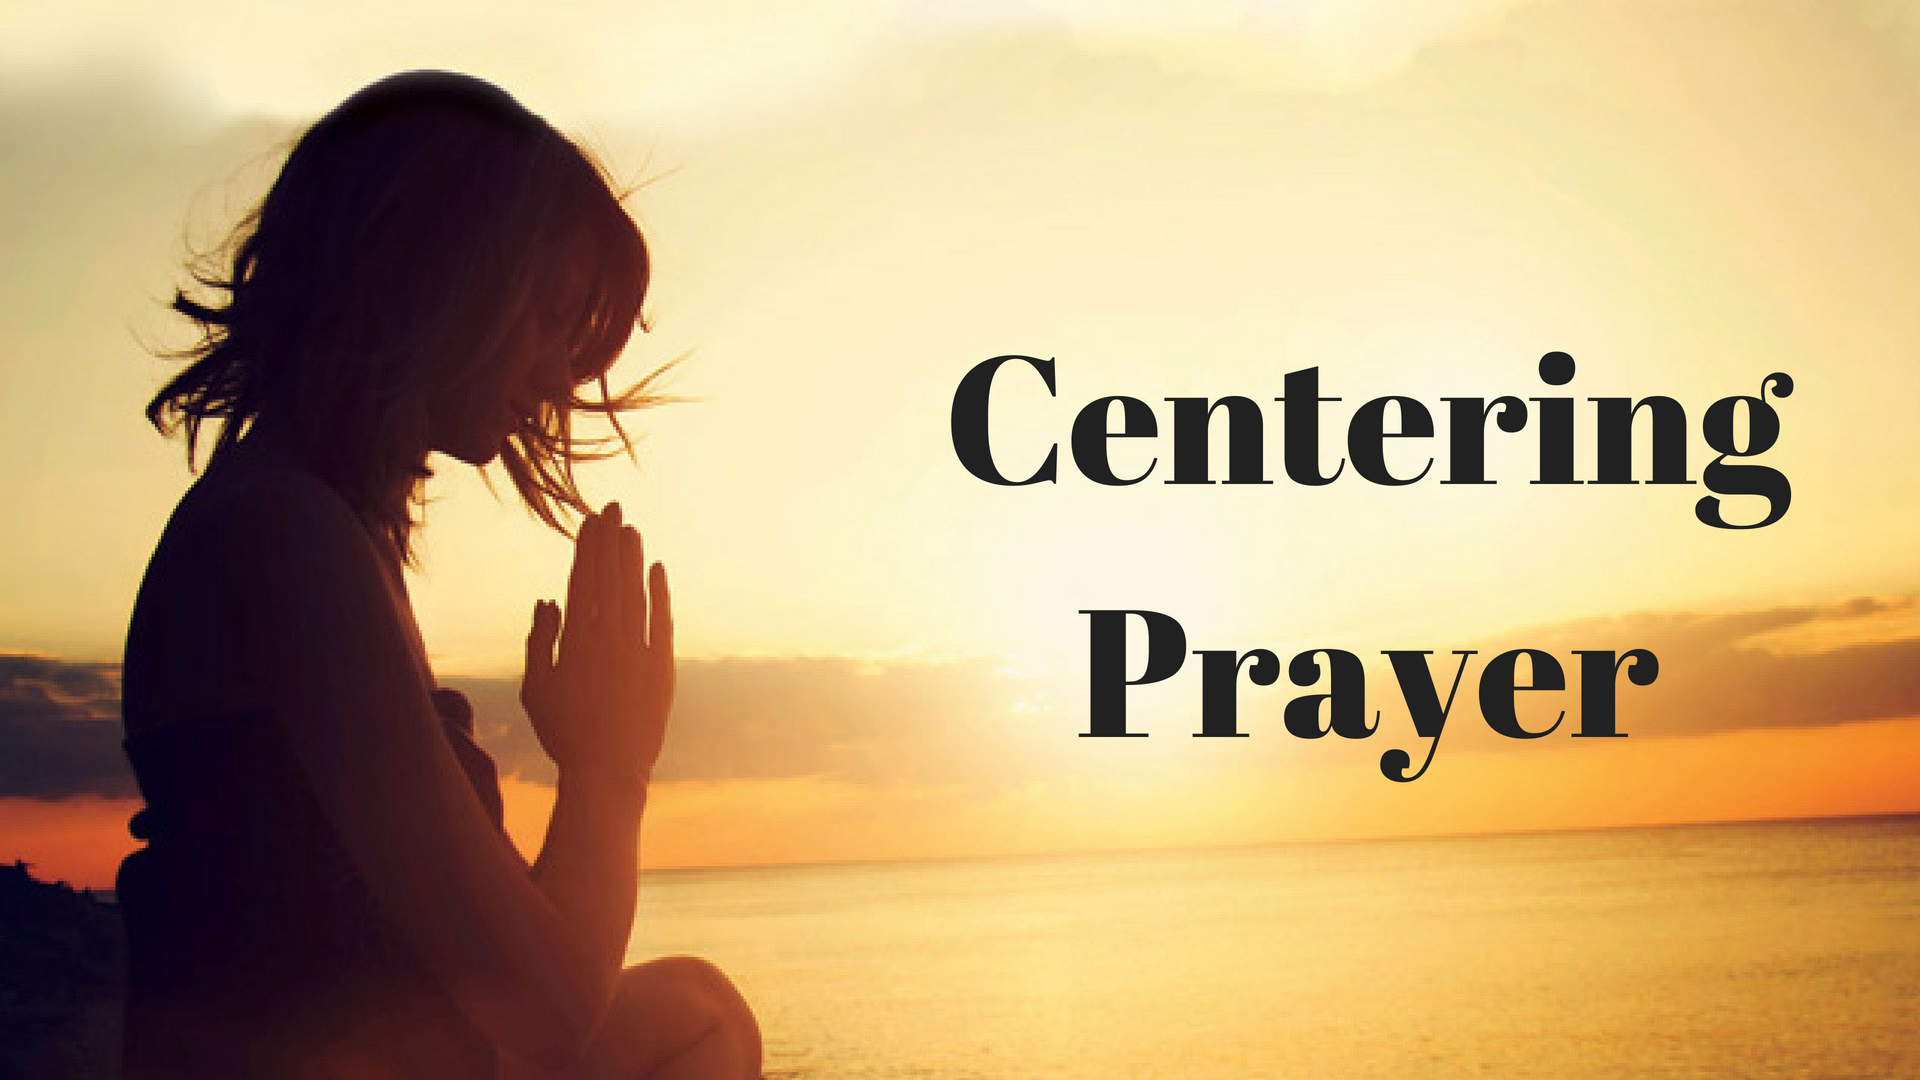 centering_prayer.jpg